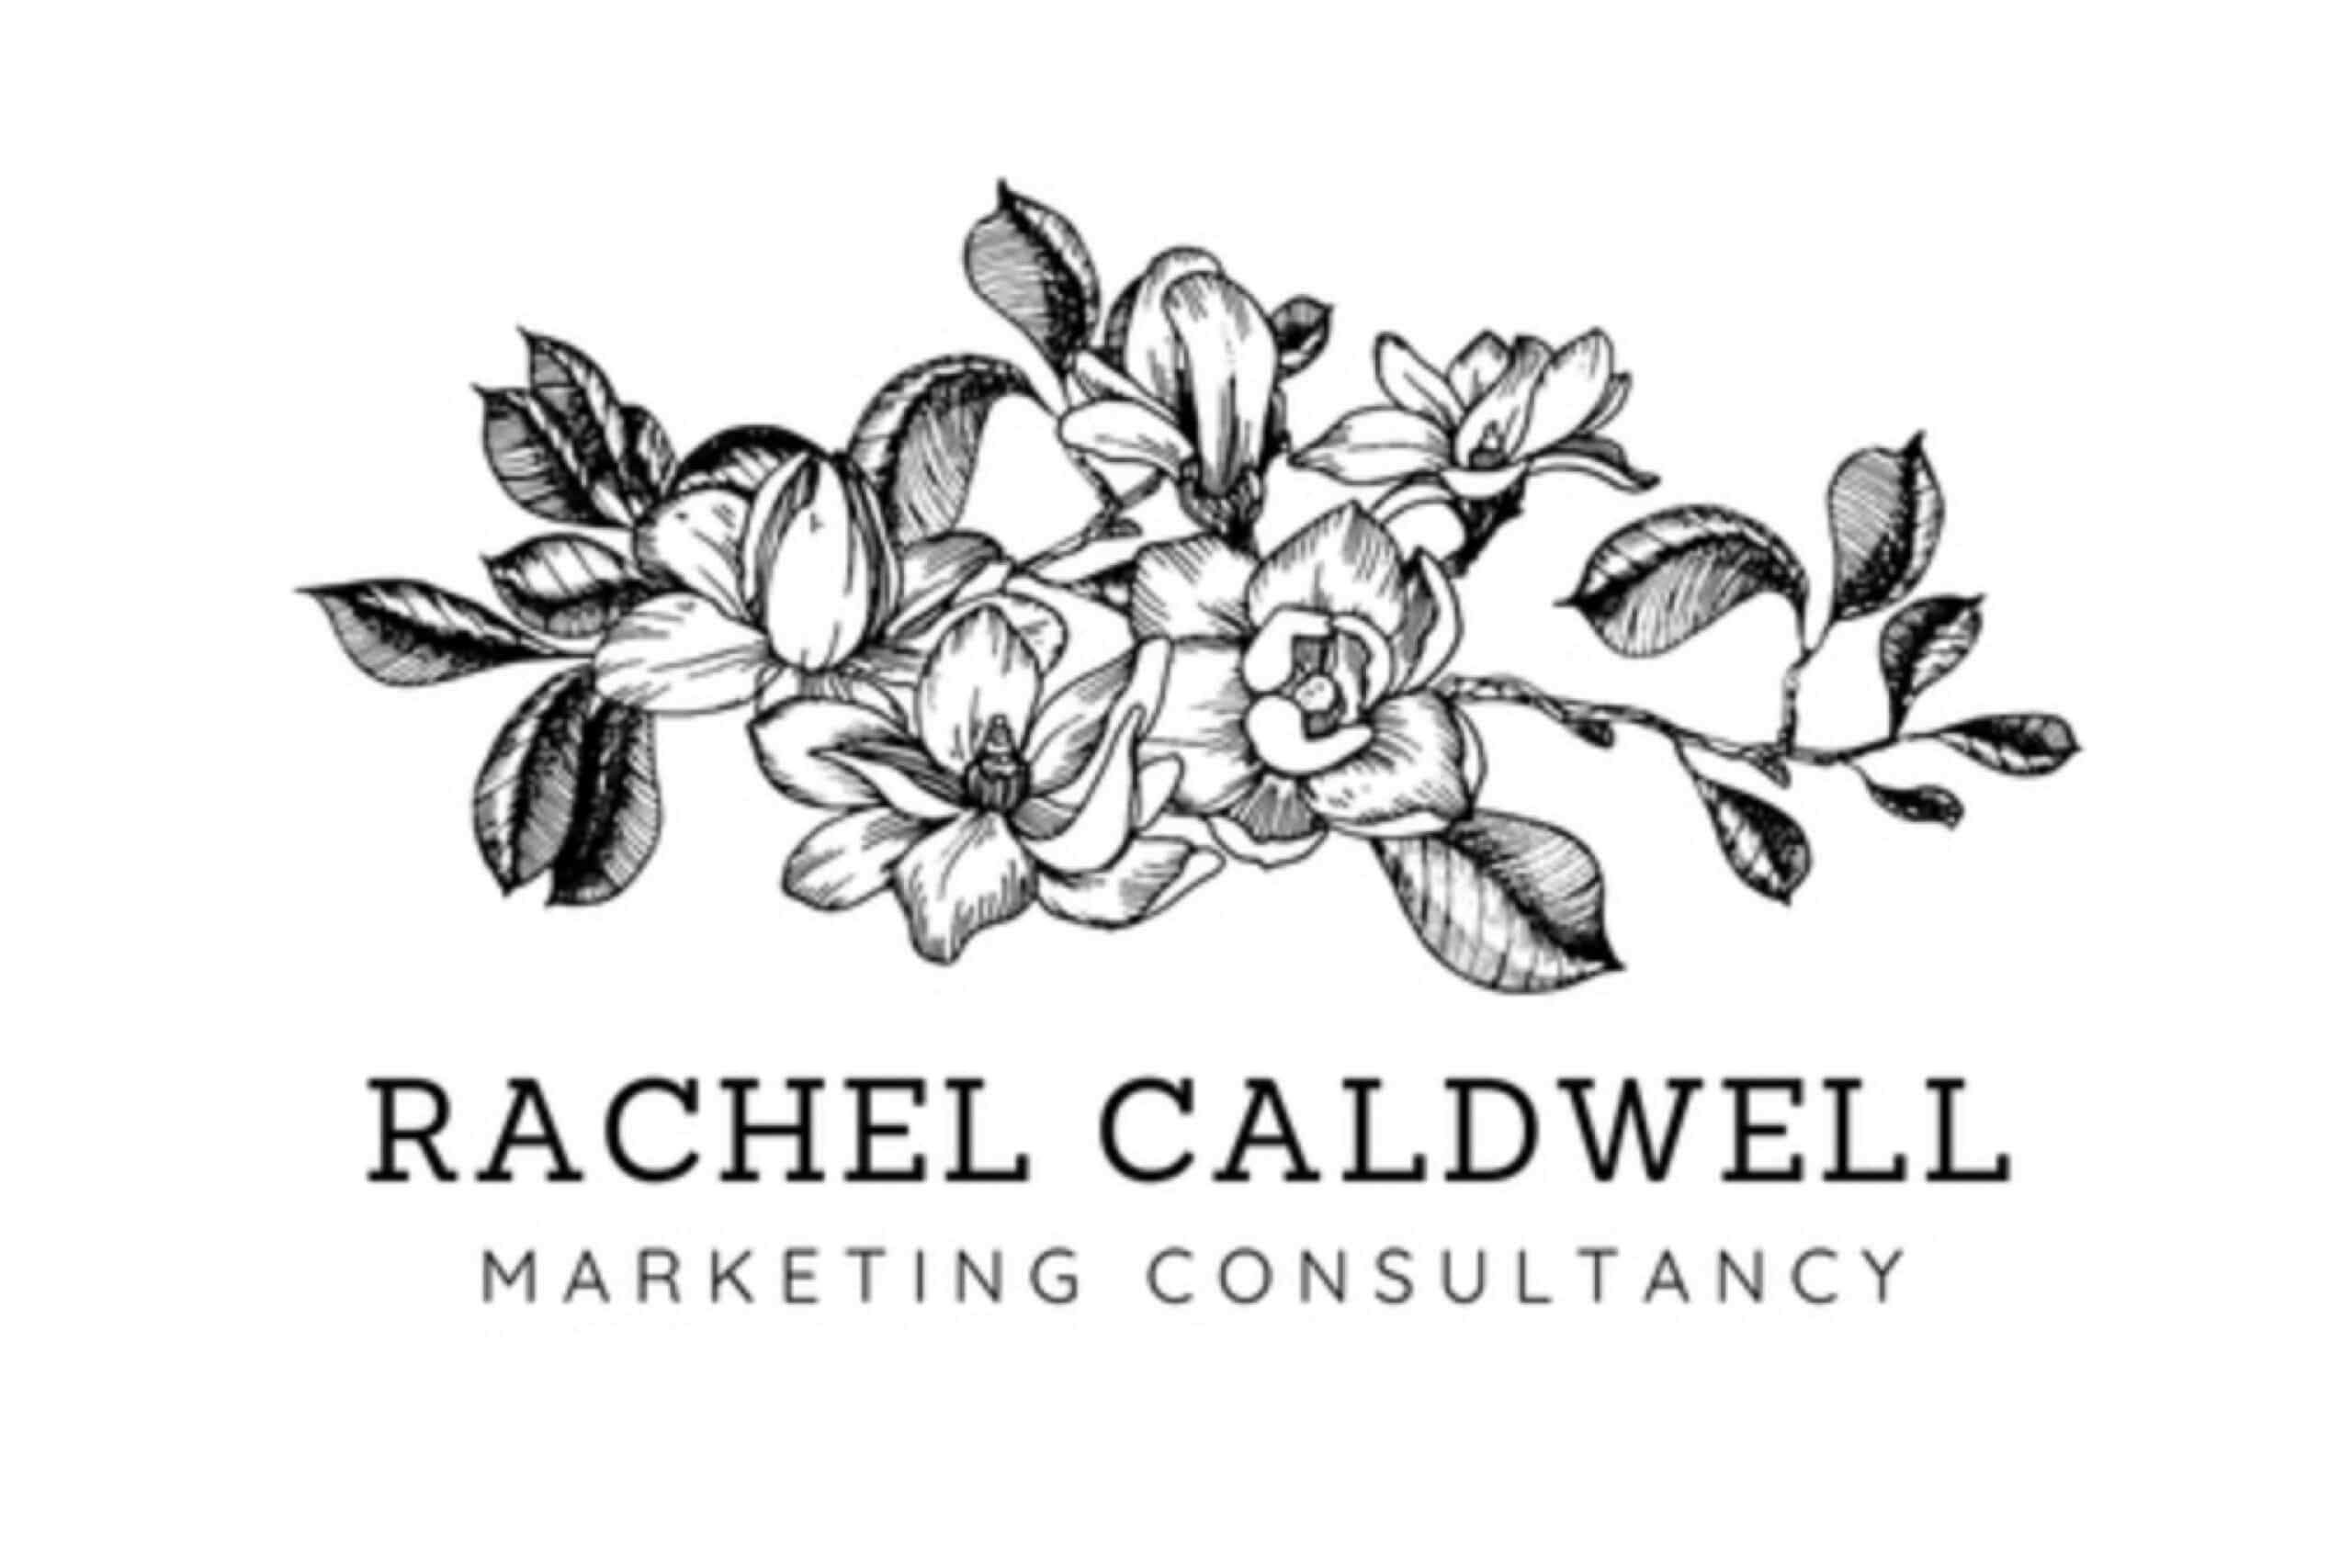 Rachel Caldwell Marketing